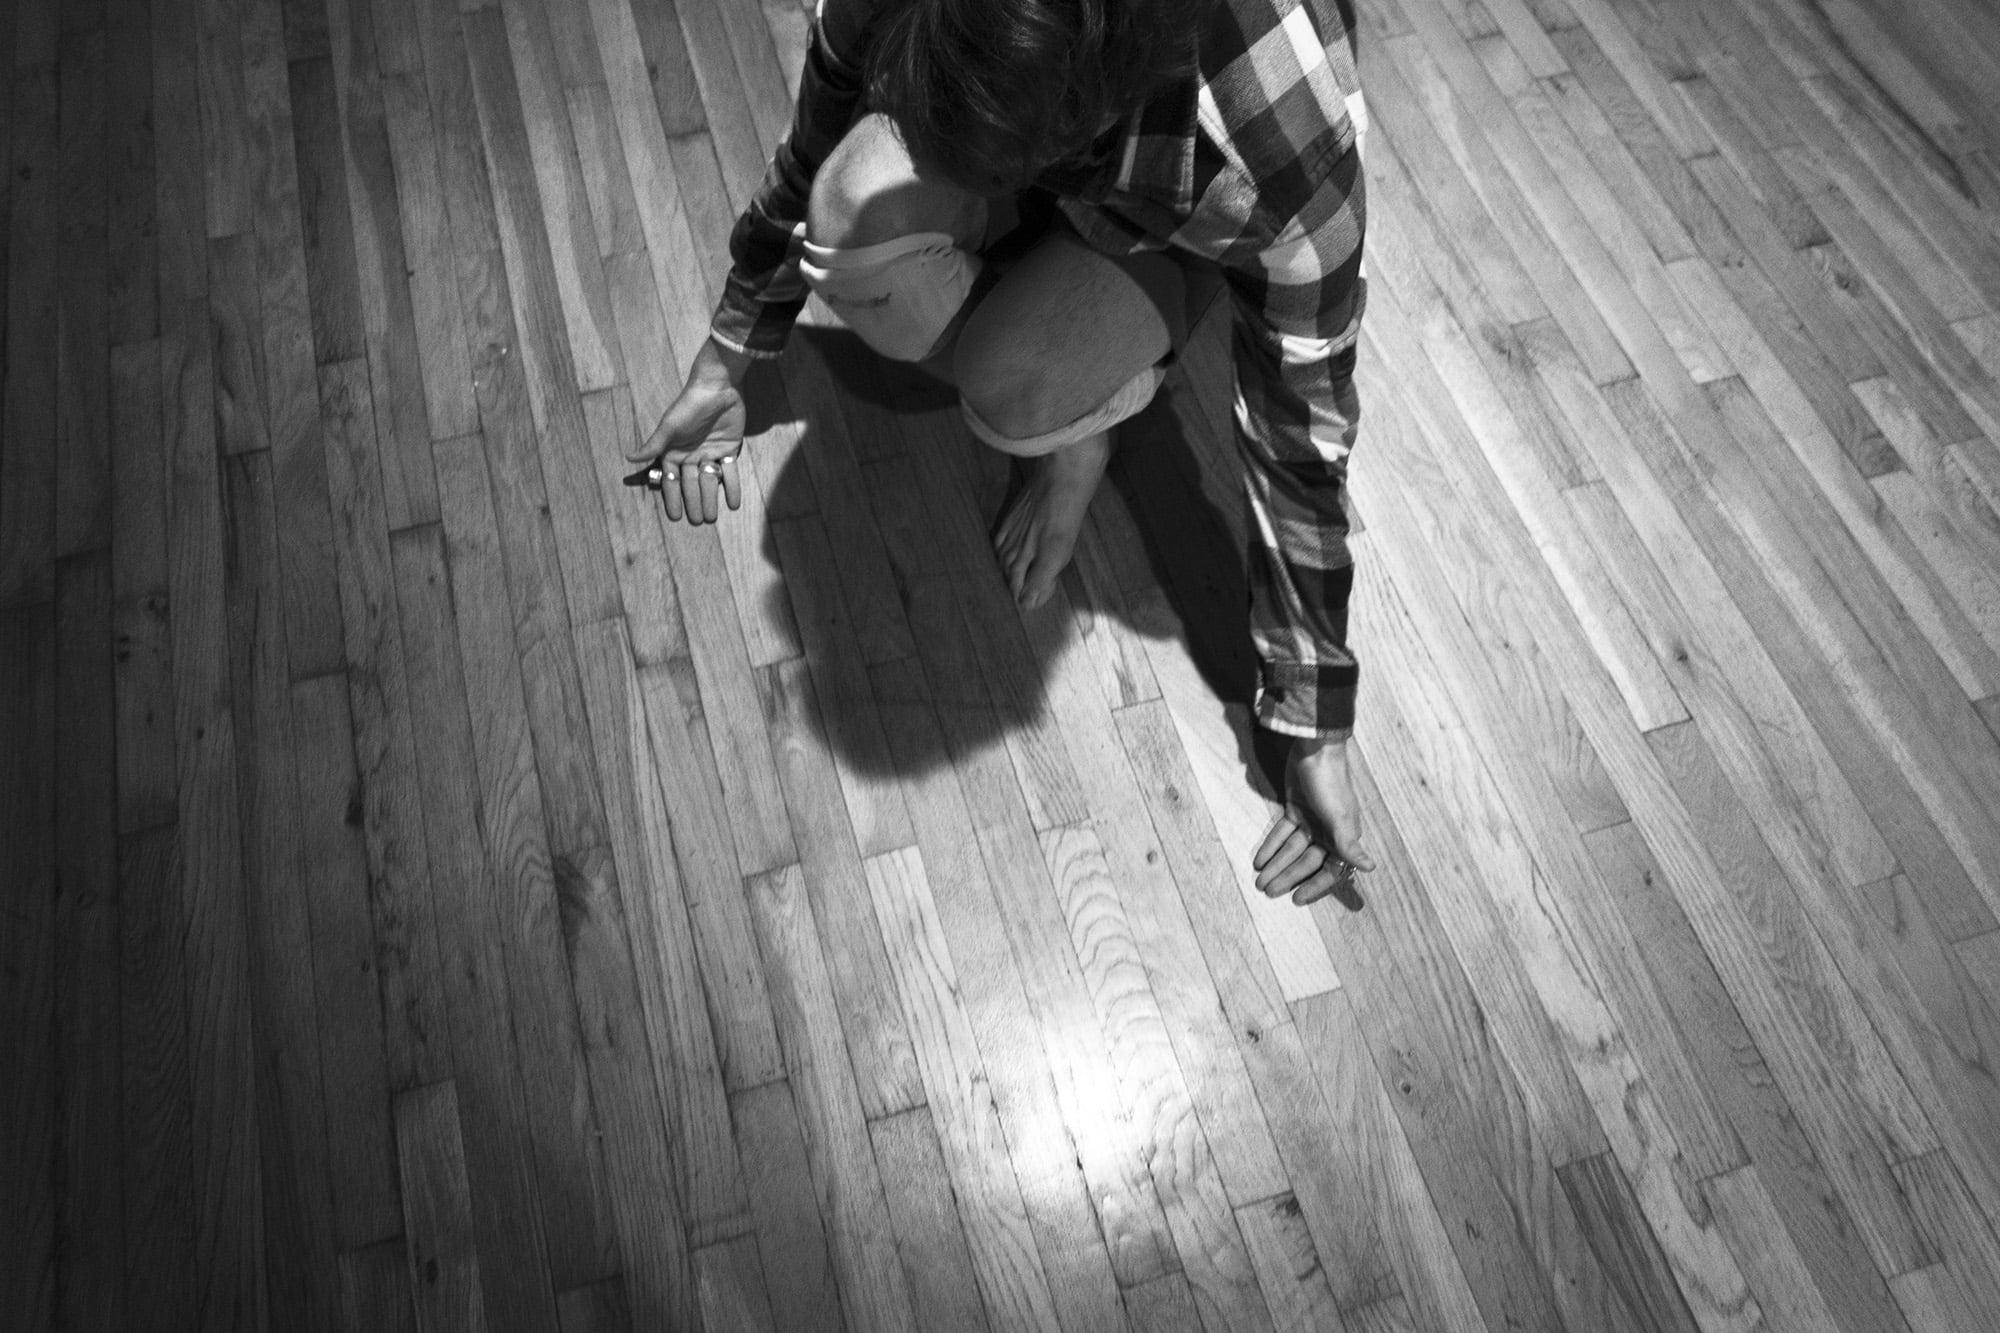 How you shone through me  Photograph by Mark Davis